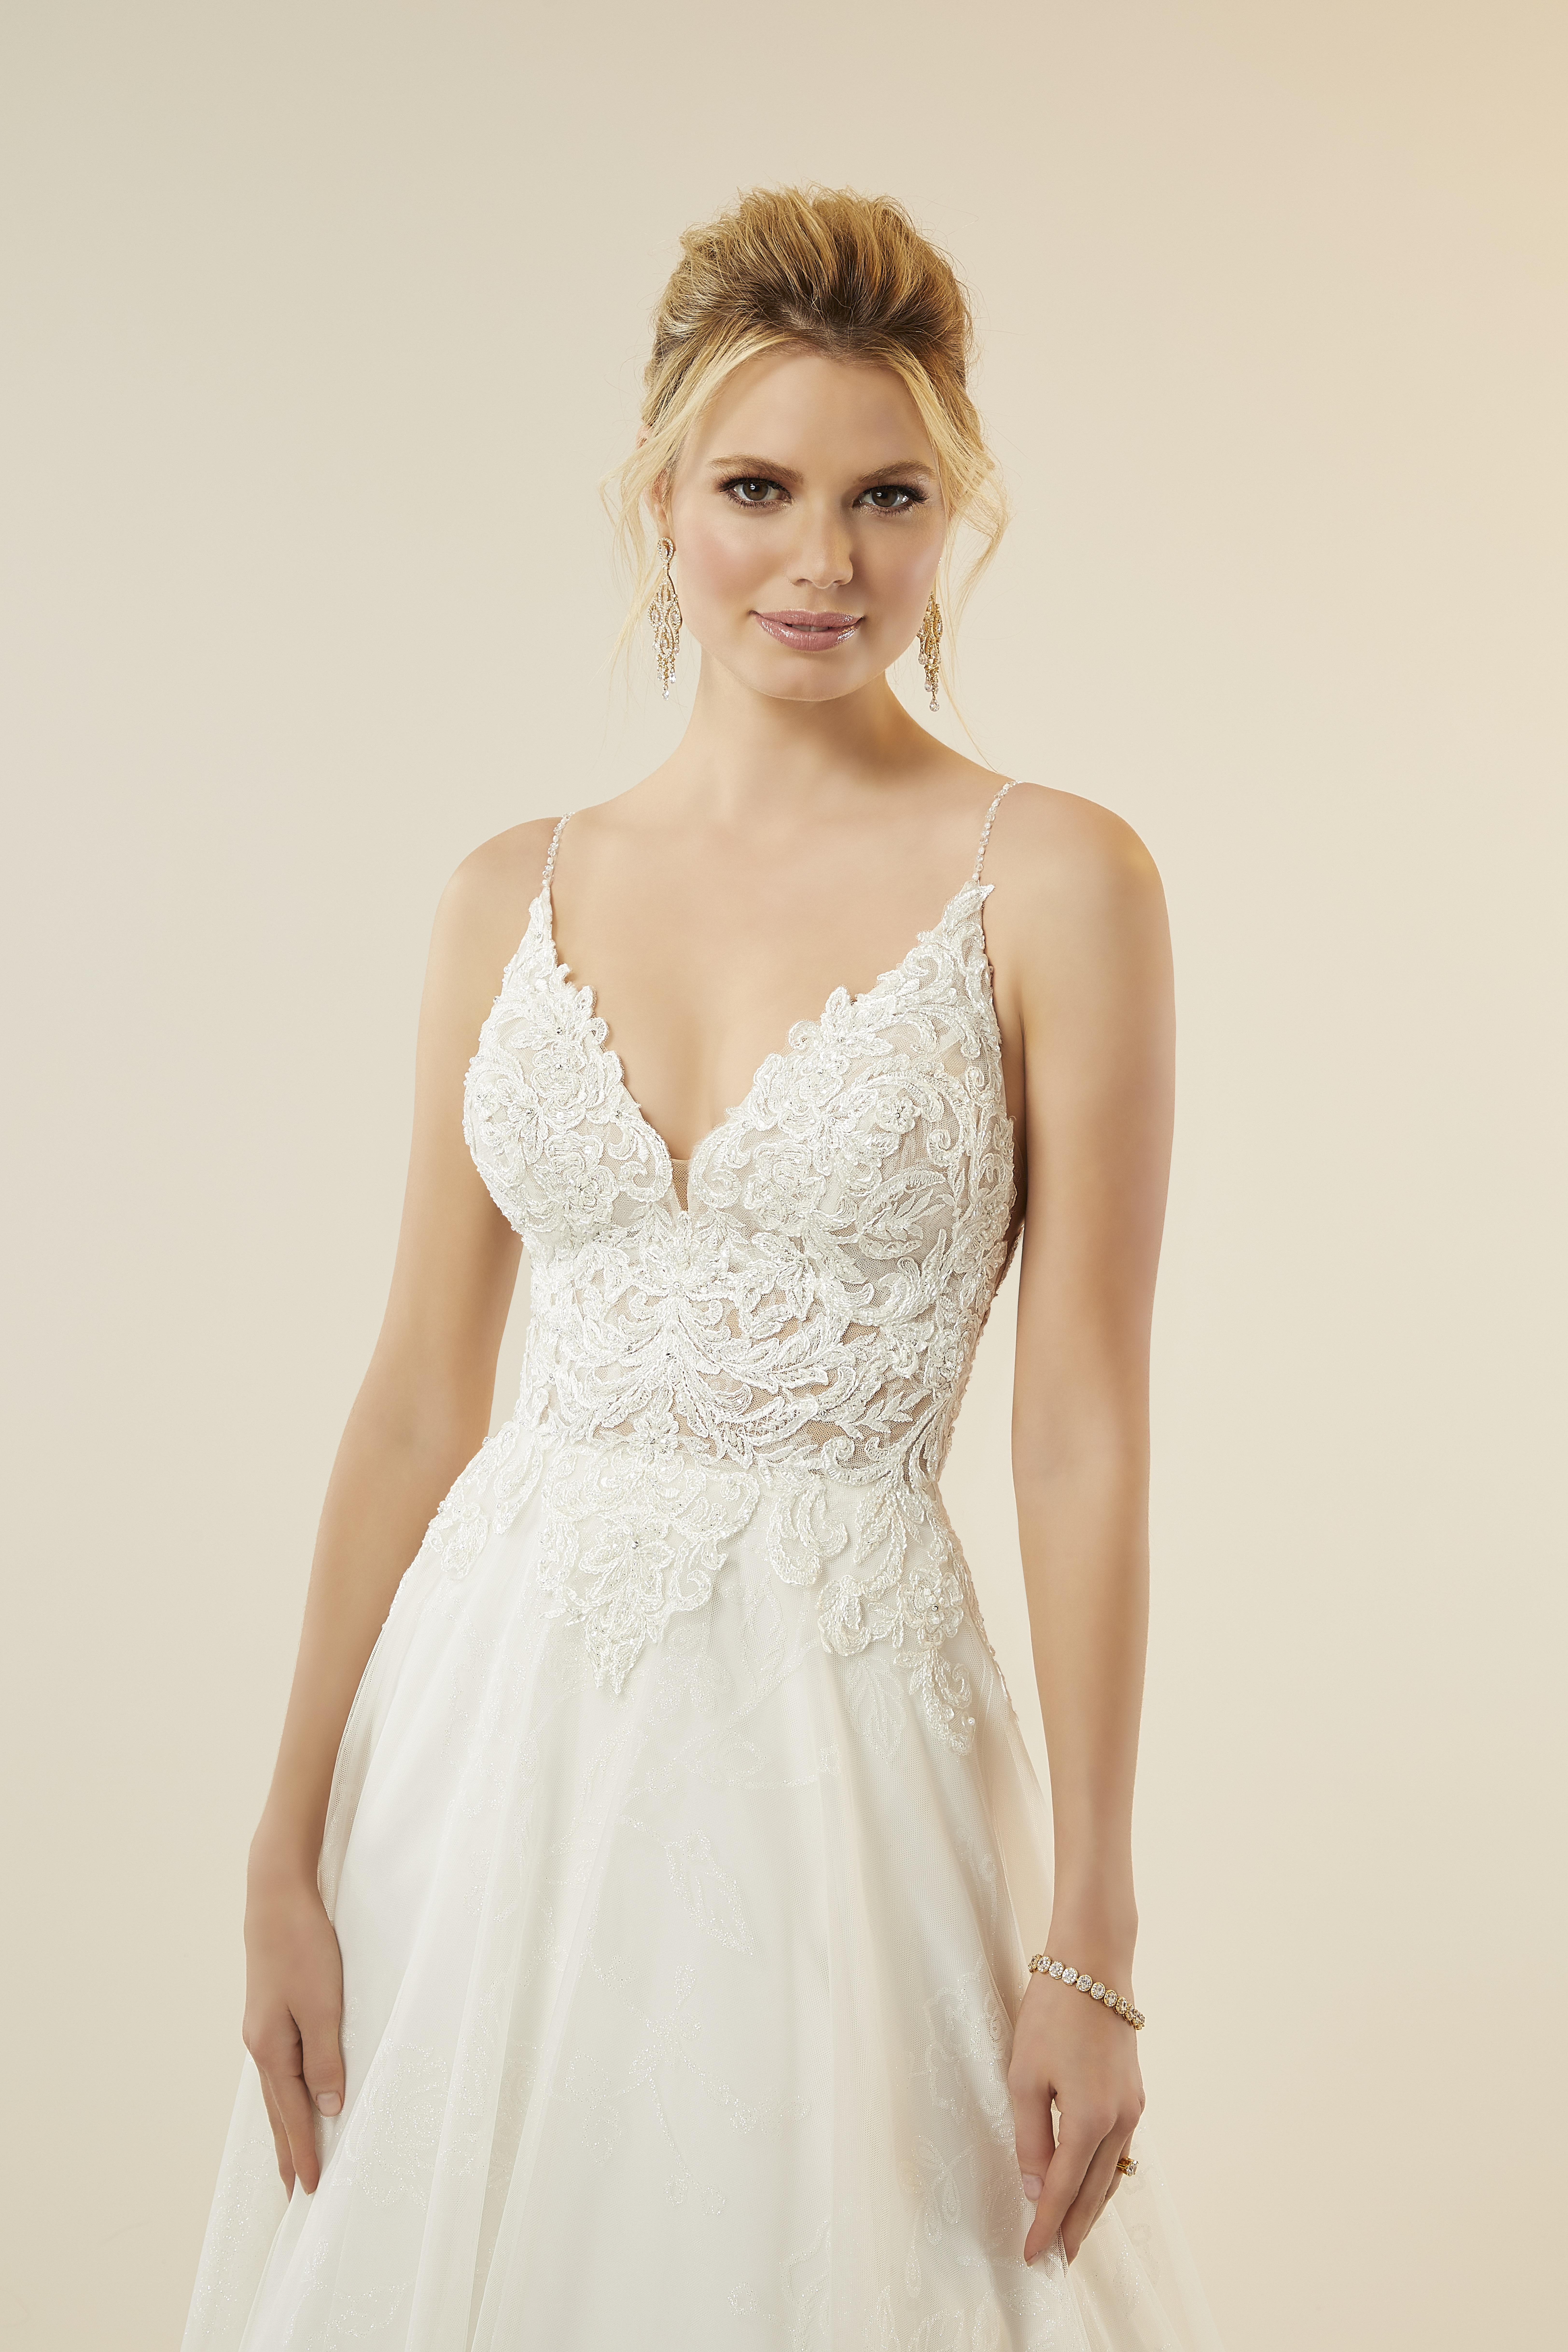 Madeline-Gardner-New-York-51706-wedding-dress-mirella